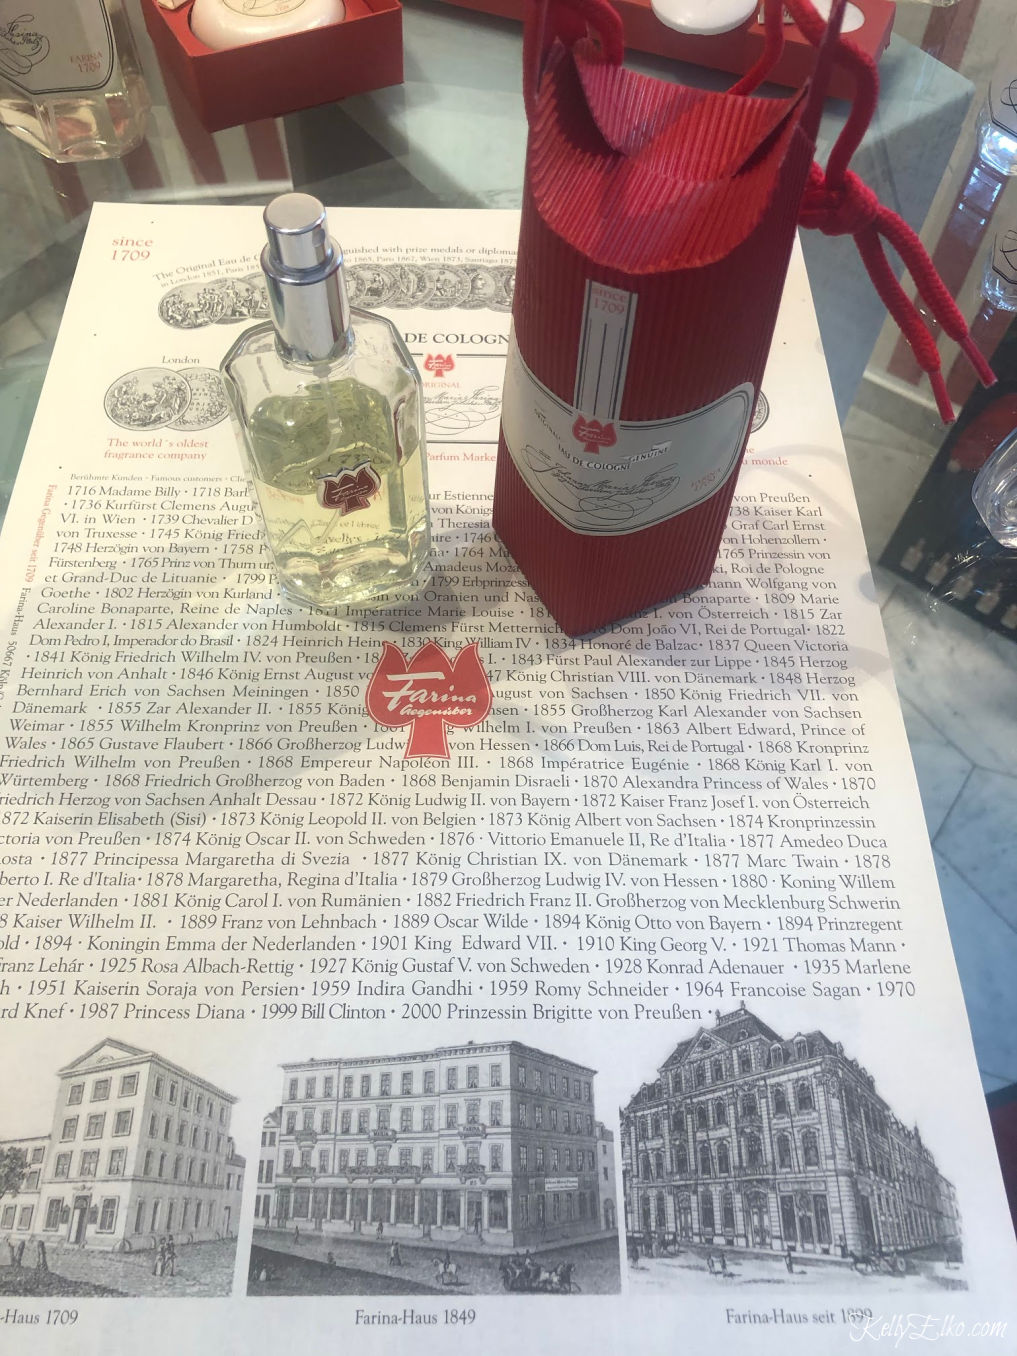 Farina Fragrance Museum makes the original Eau de Cologne Farina 1709 kellyelko.com #eaudecologne #farina1709 #colognegermany #perfume #farina #rhineriver #germany #travelblogger #rhinerivercruise